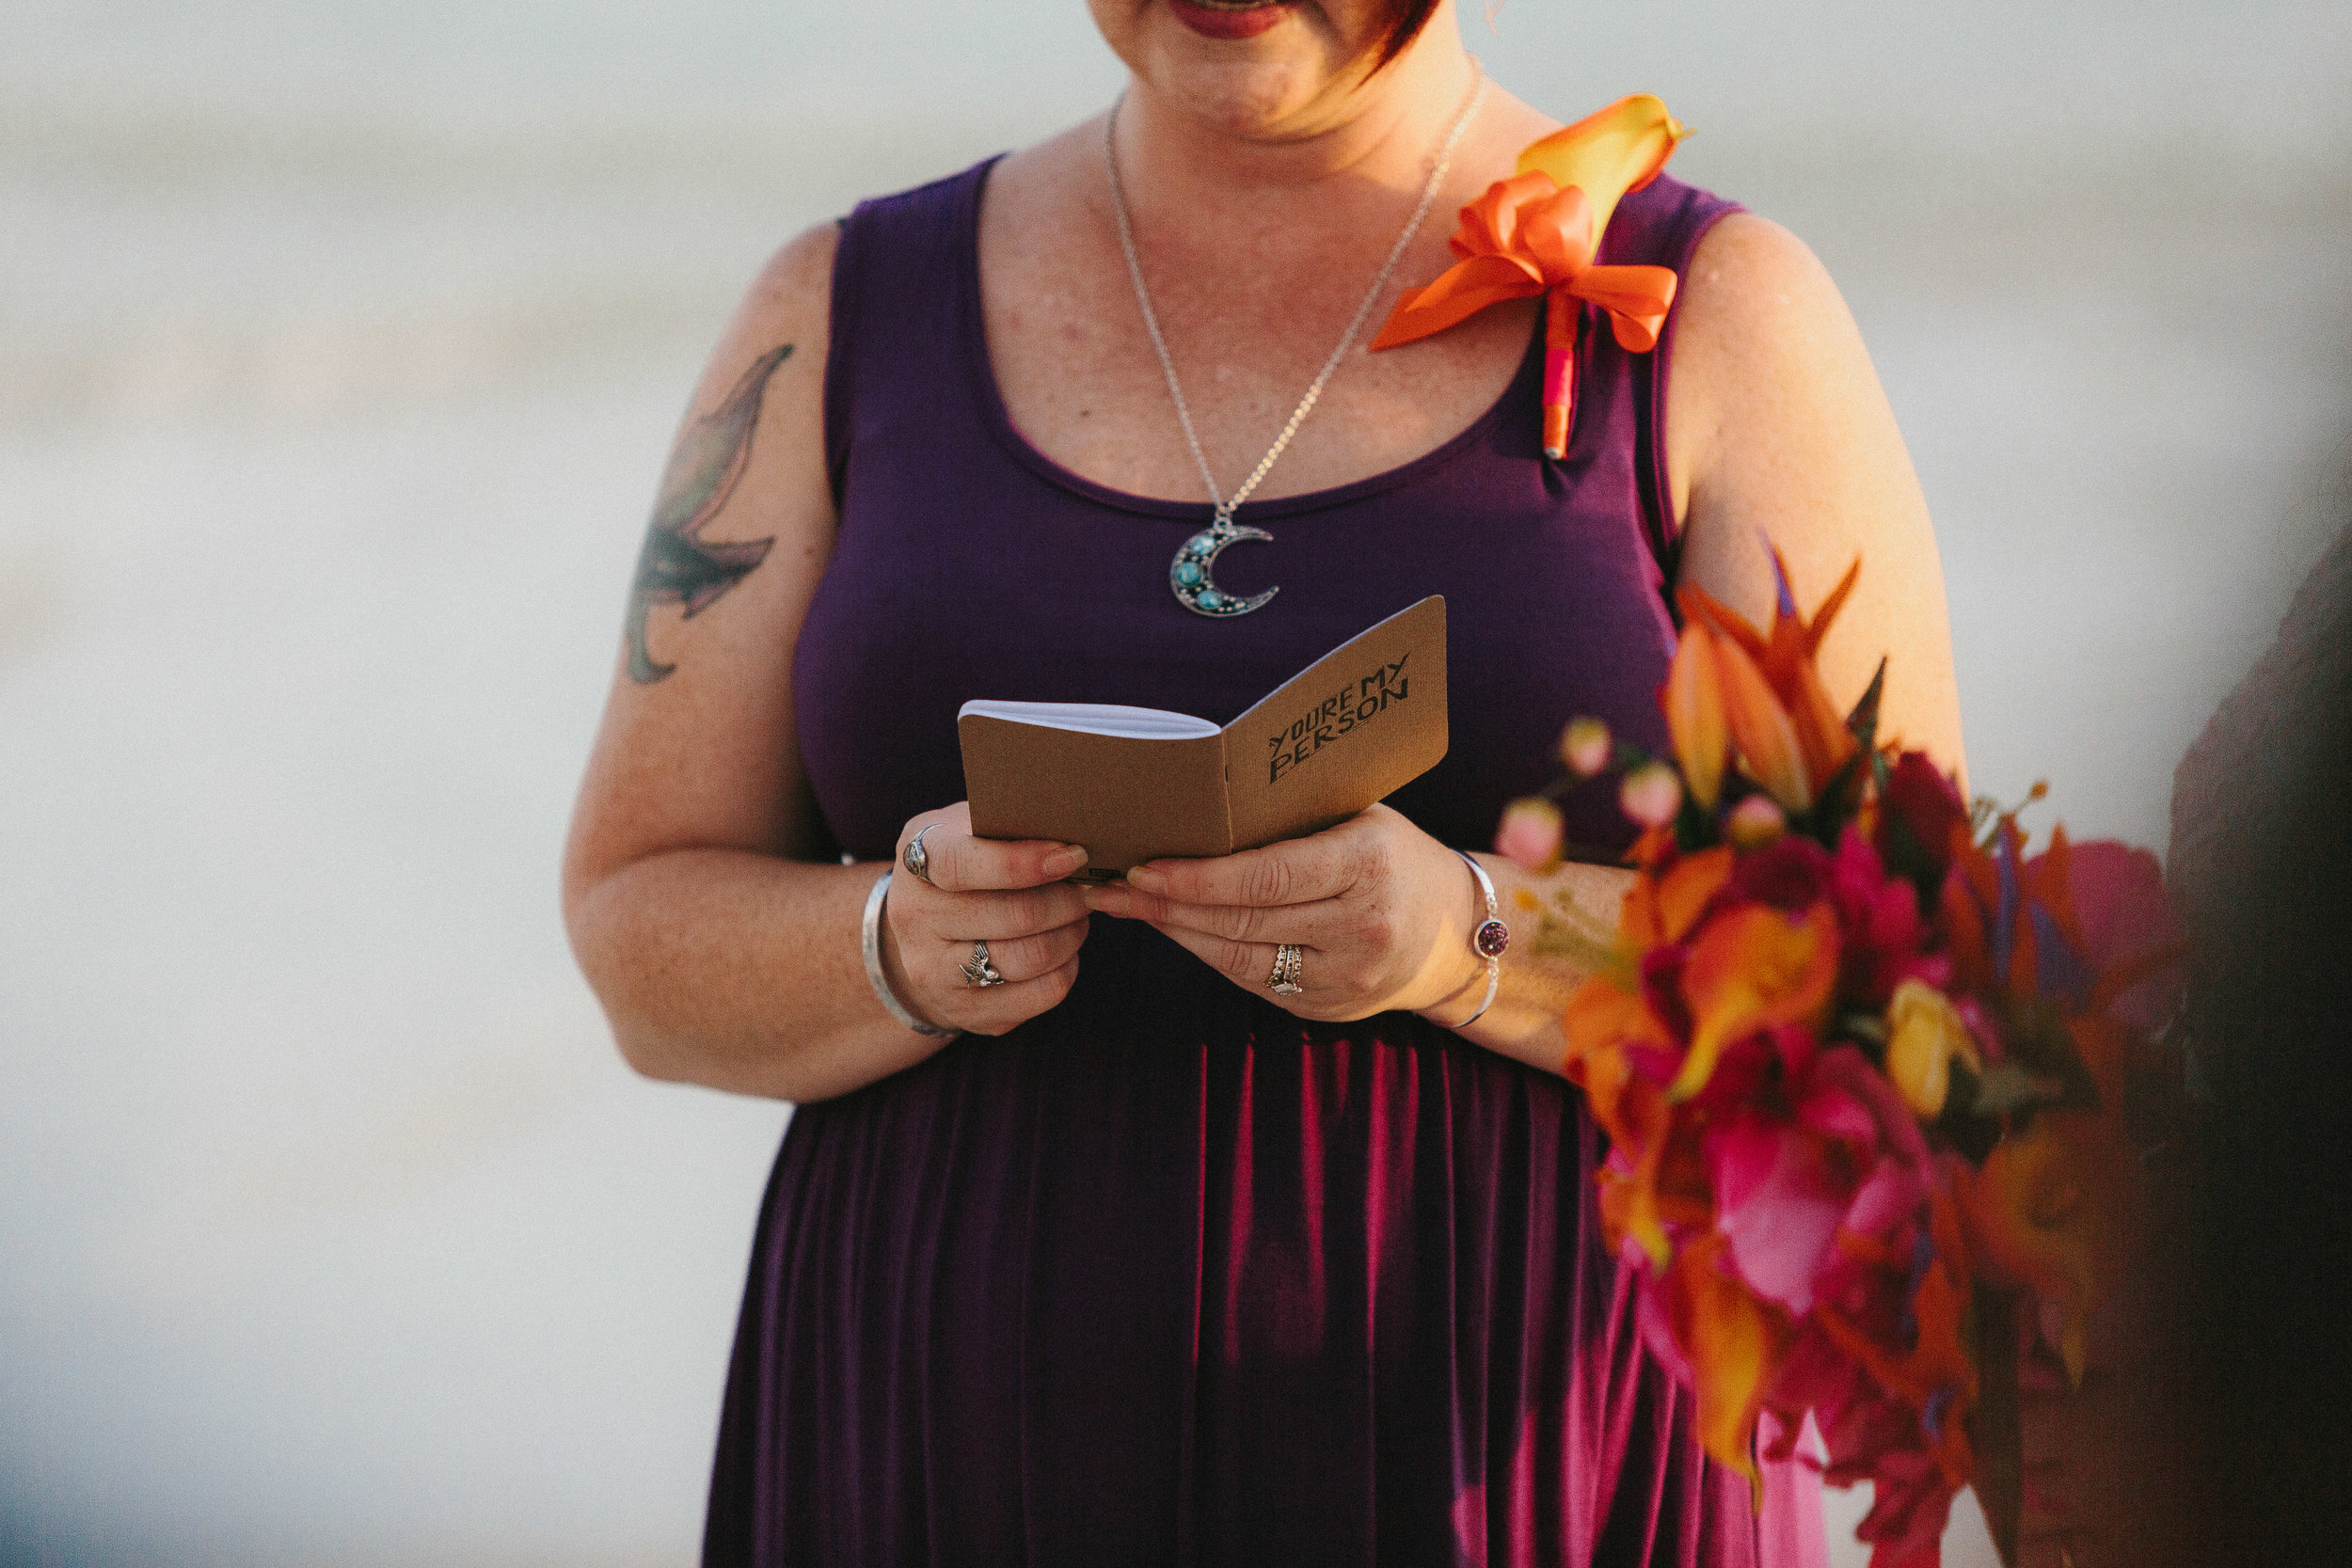 destin_sunset_beach_elopement_intimate_wedding_photographer_florida_documentary_1156.jpg